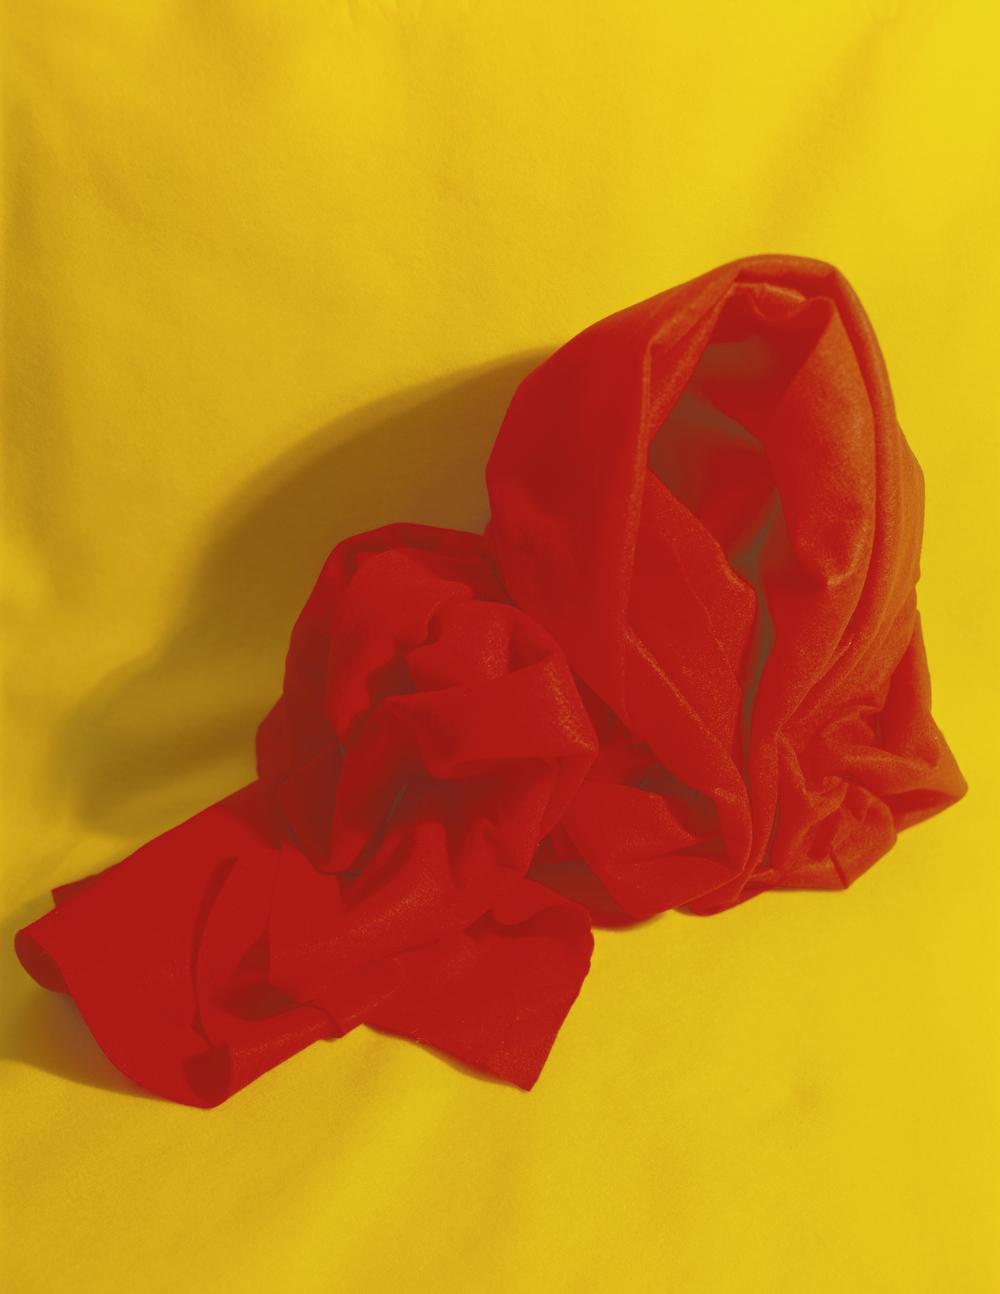 IX (Red and Yellow   Fold), C-Print,22 x 17, 2011